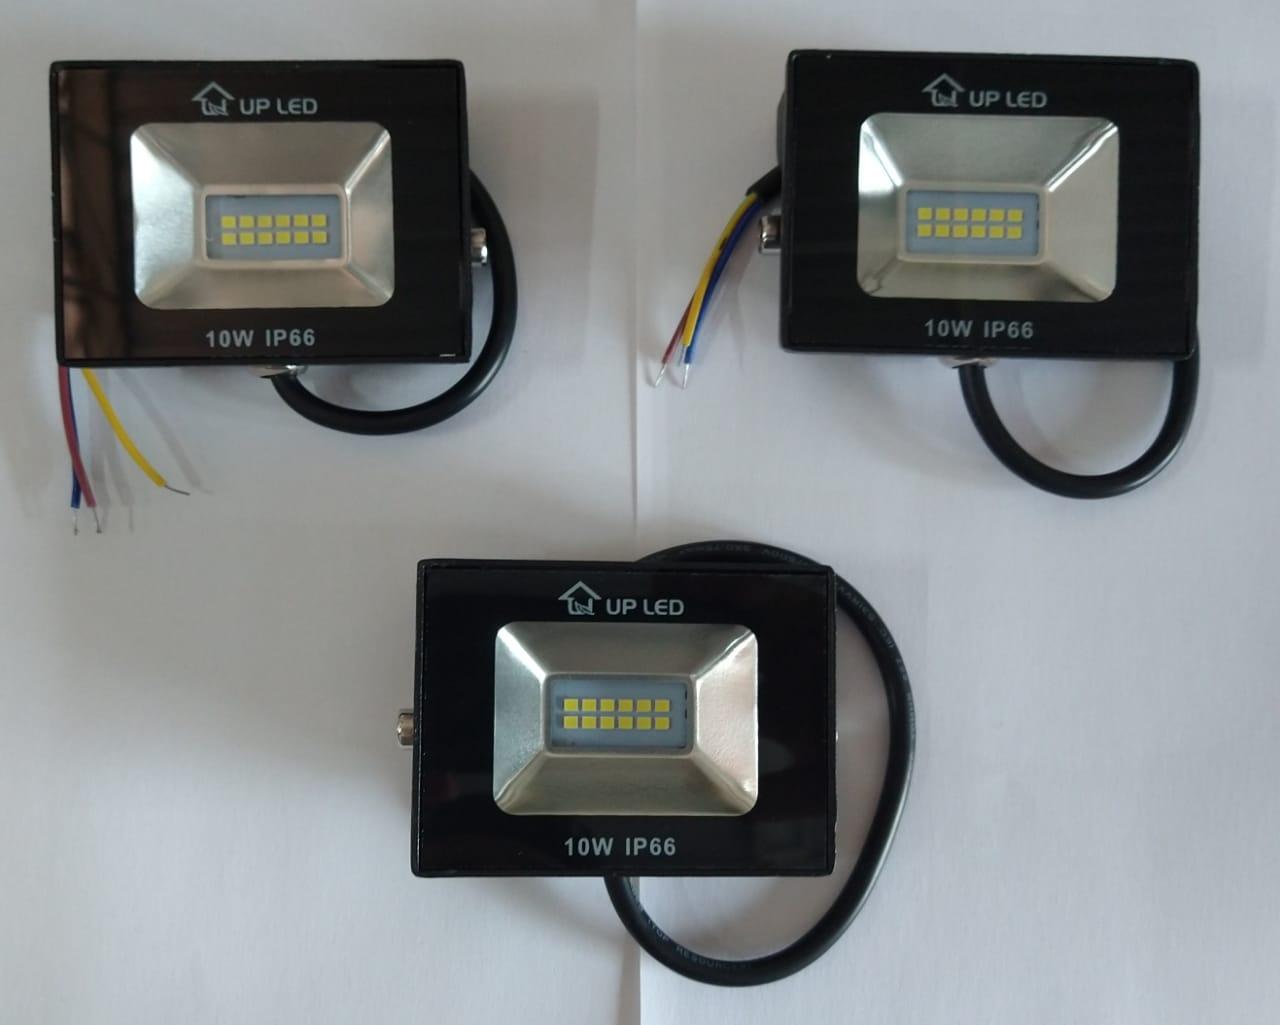 KIT 3 REFLETORES LED SMD 10W 6500K UPLED